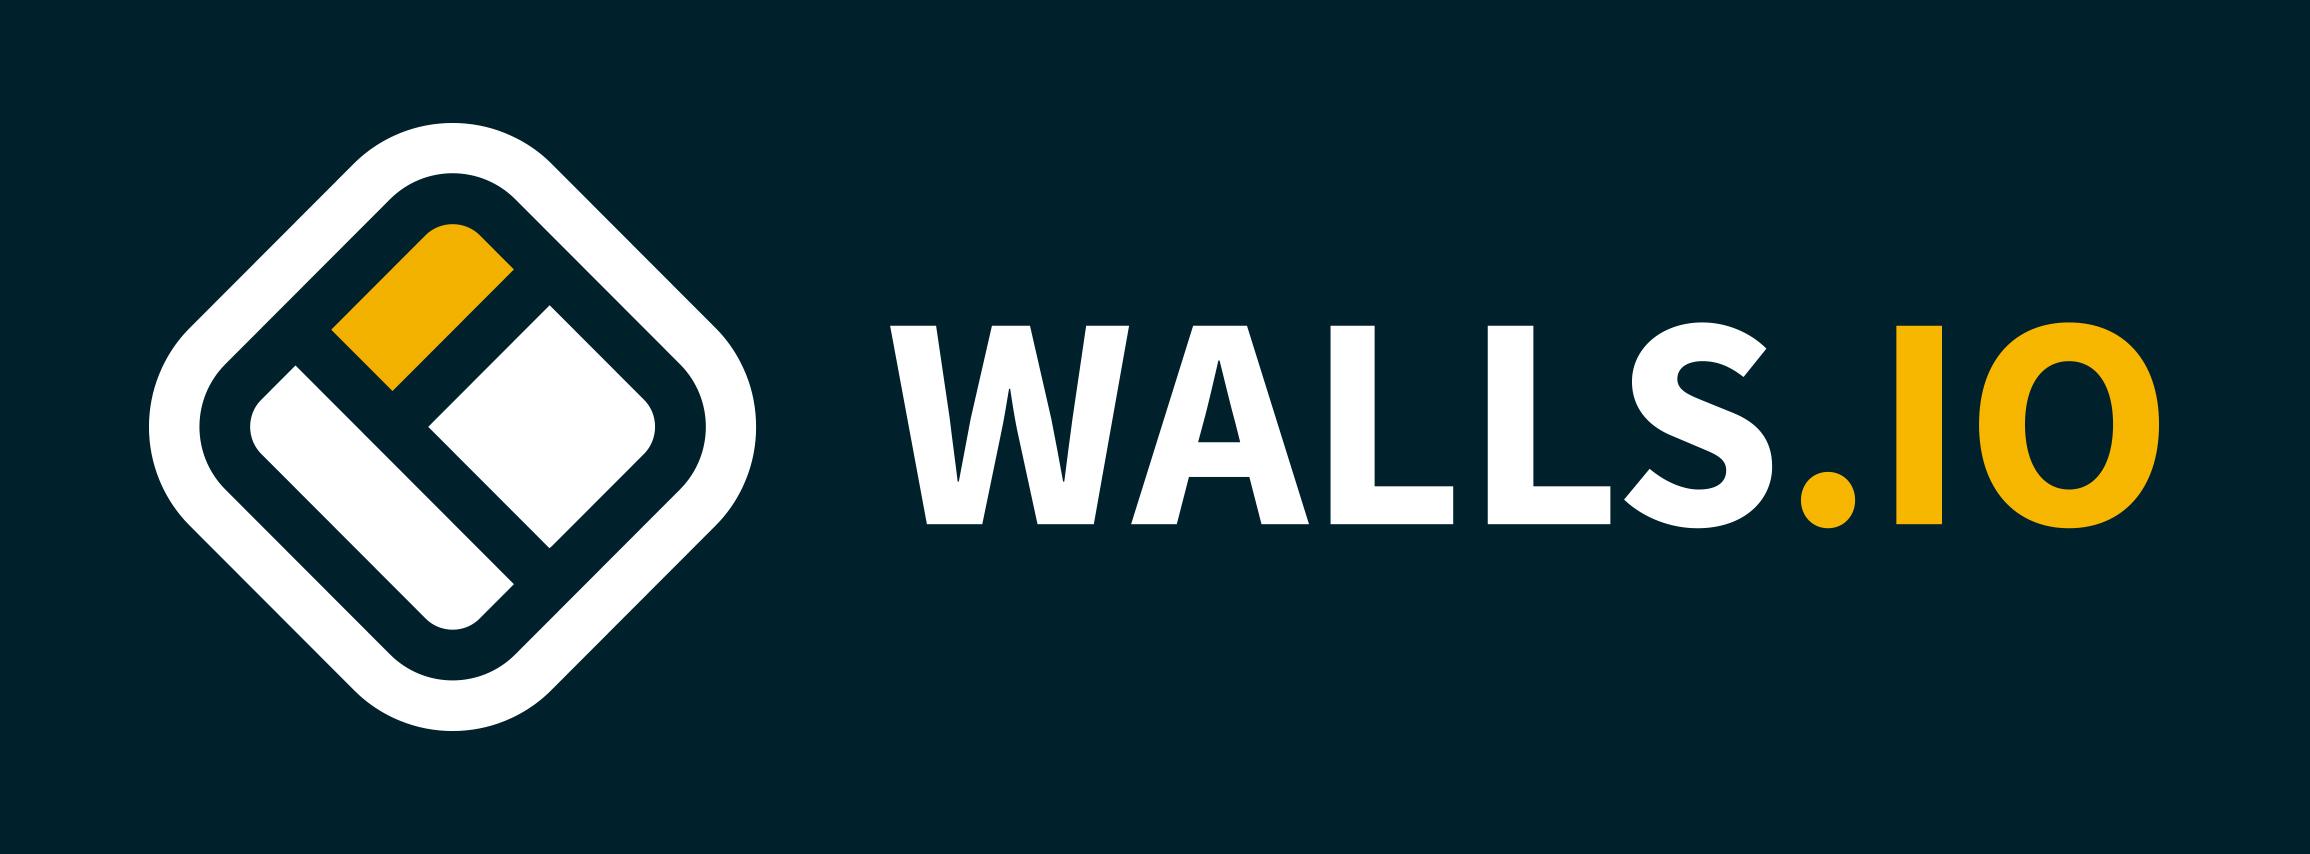 Walls.io Help Center